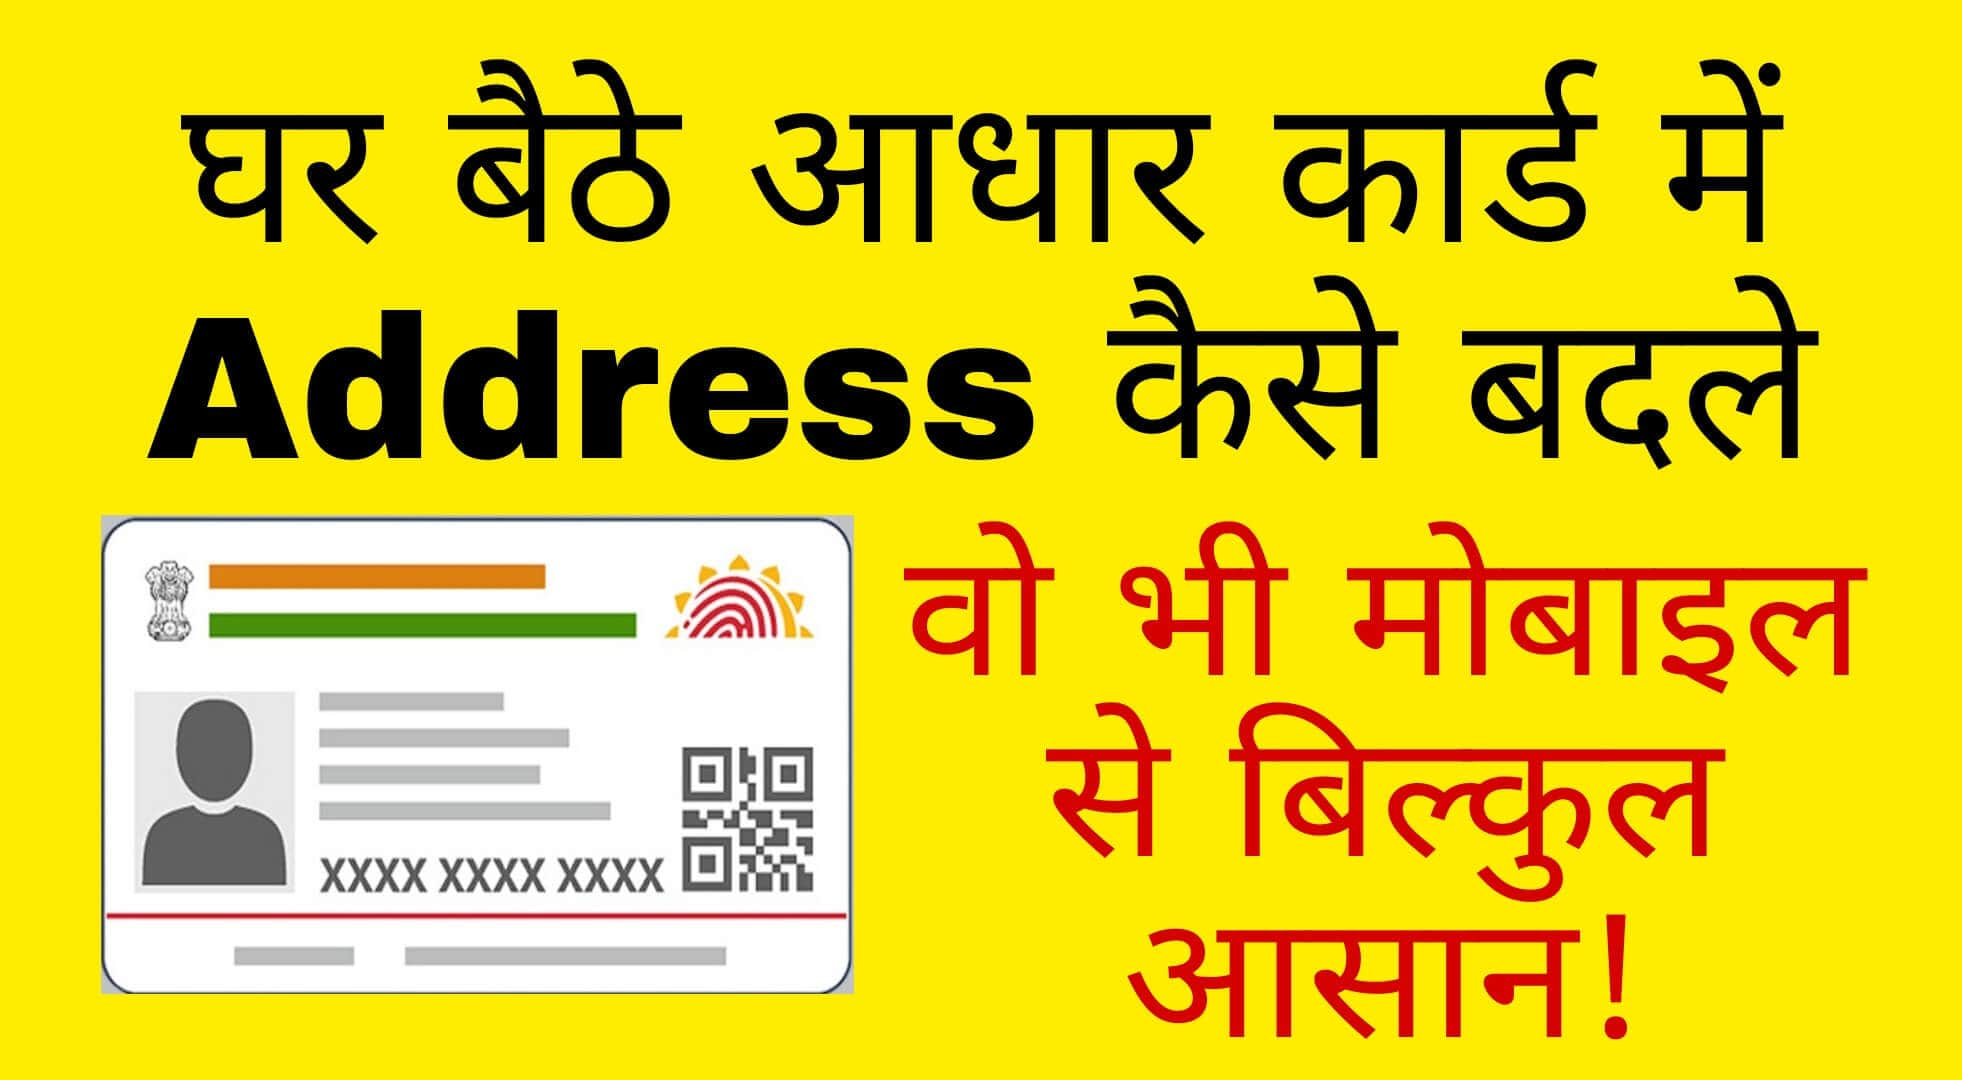 Aadhar Card Me Address Kaise Change Kare